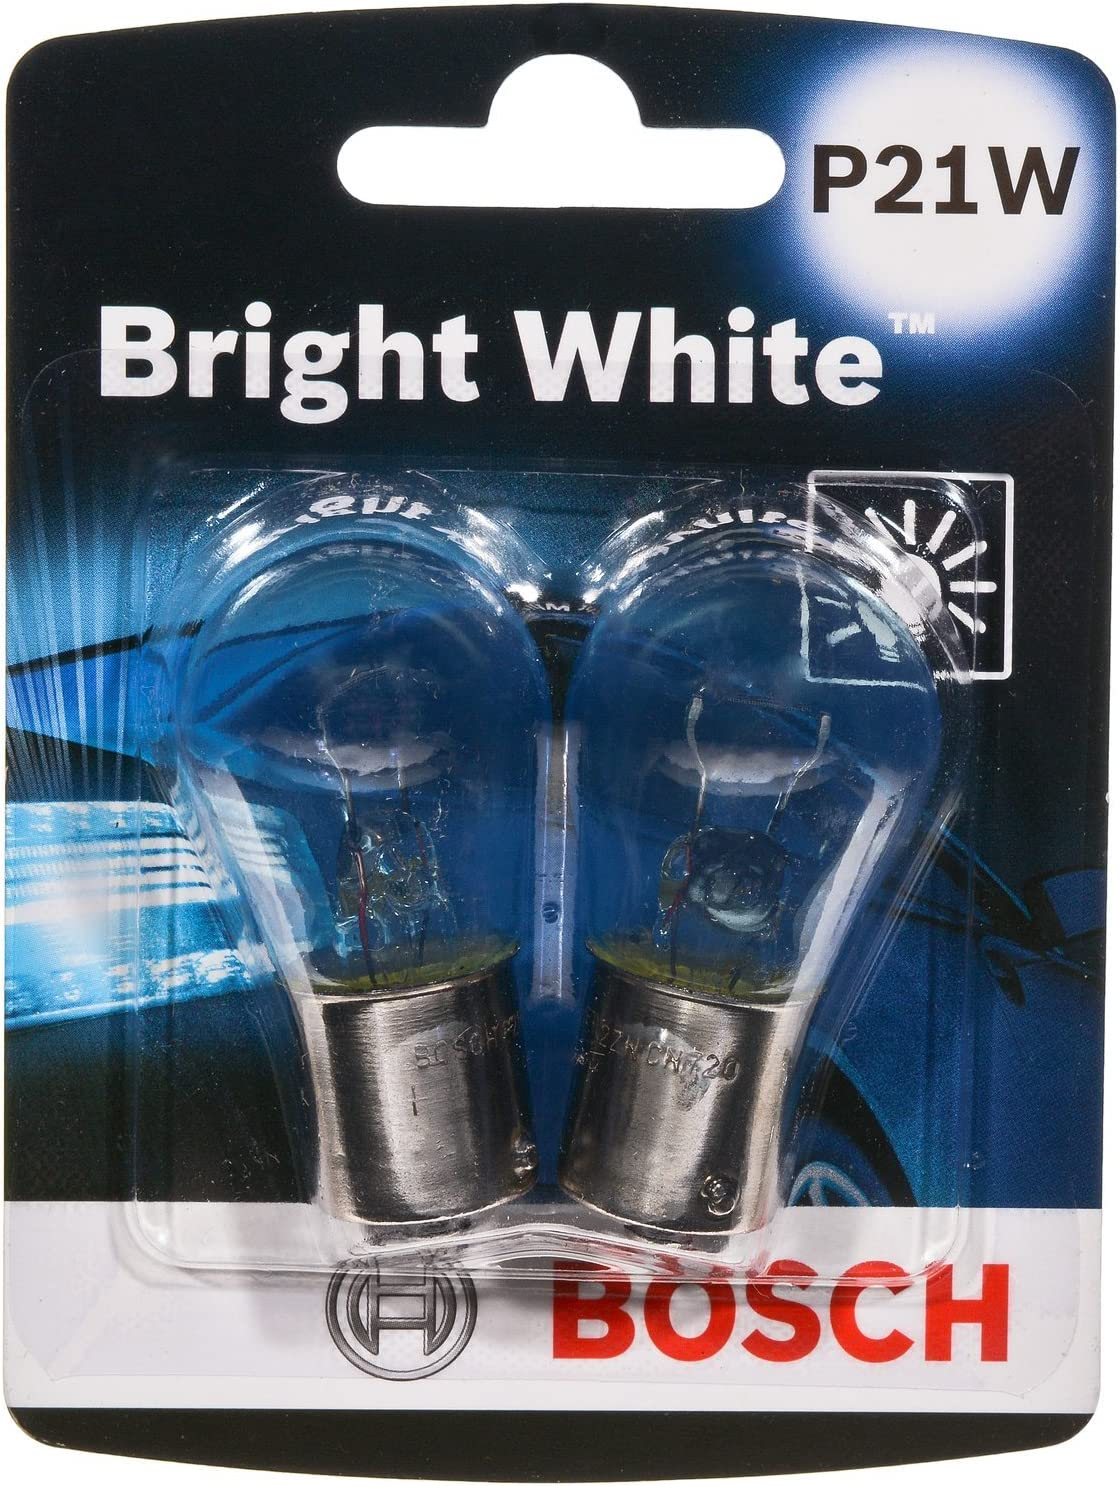 Bosch P21W Bright White Upgrade Minature Bulb, Pack of 2